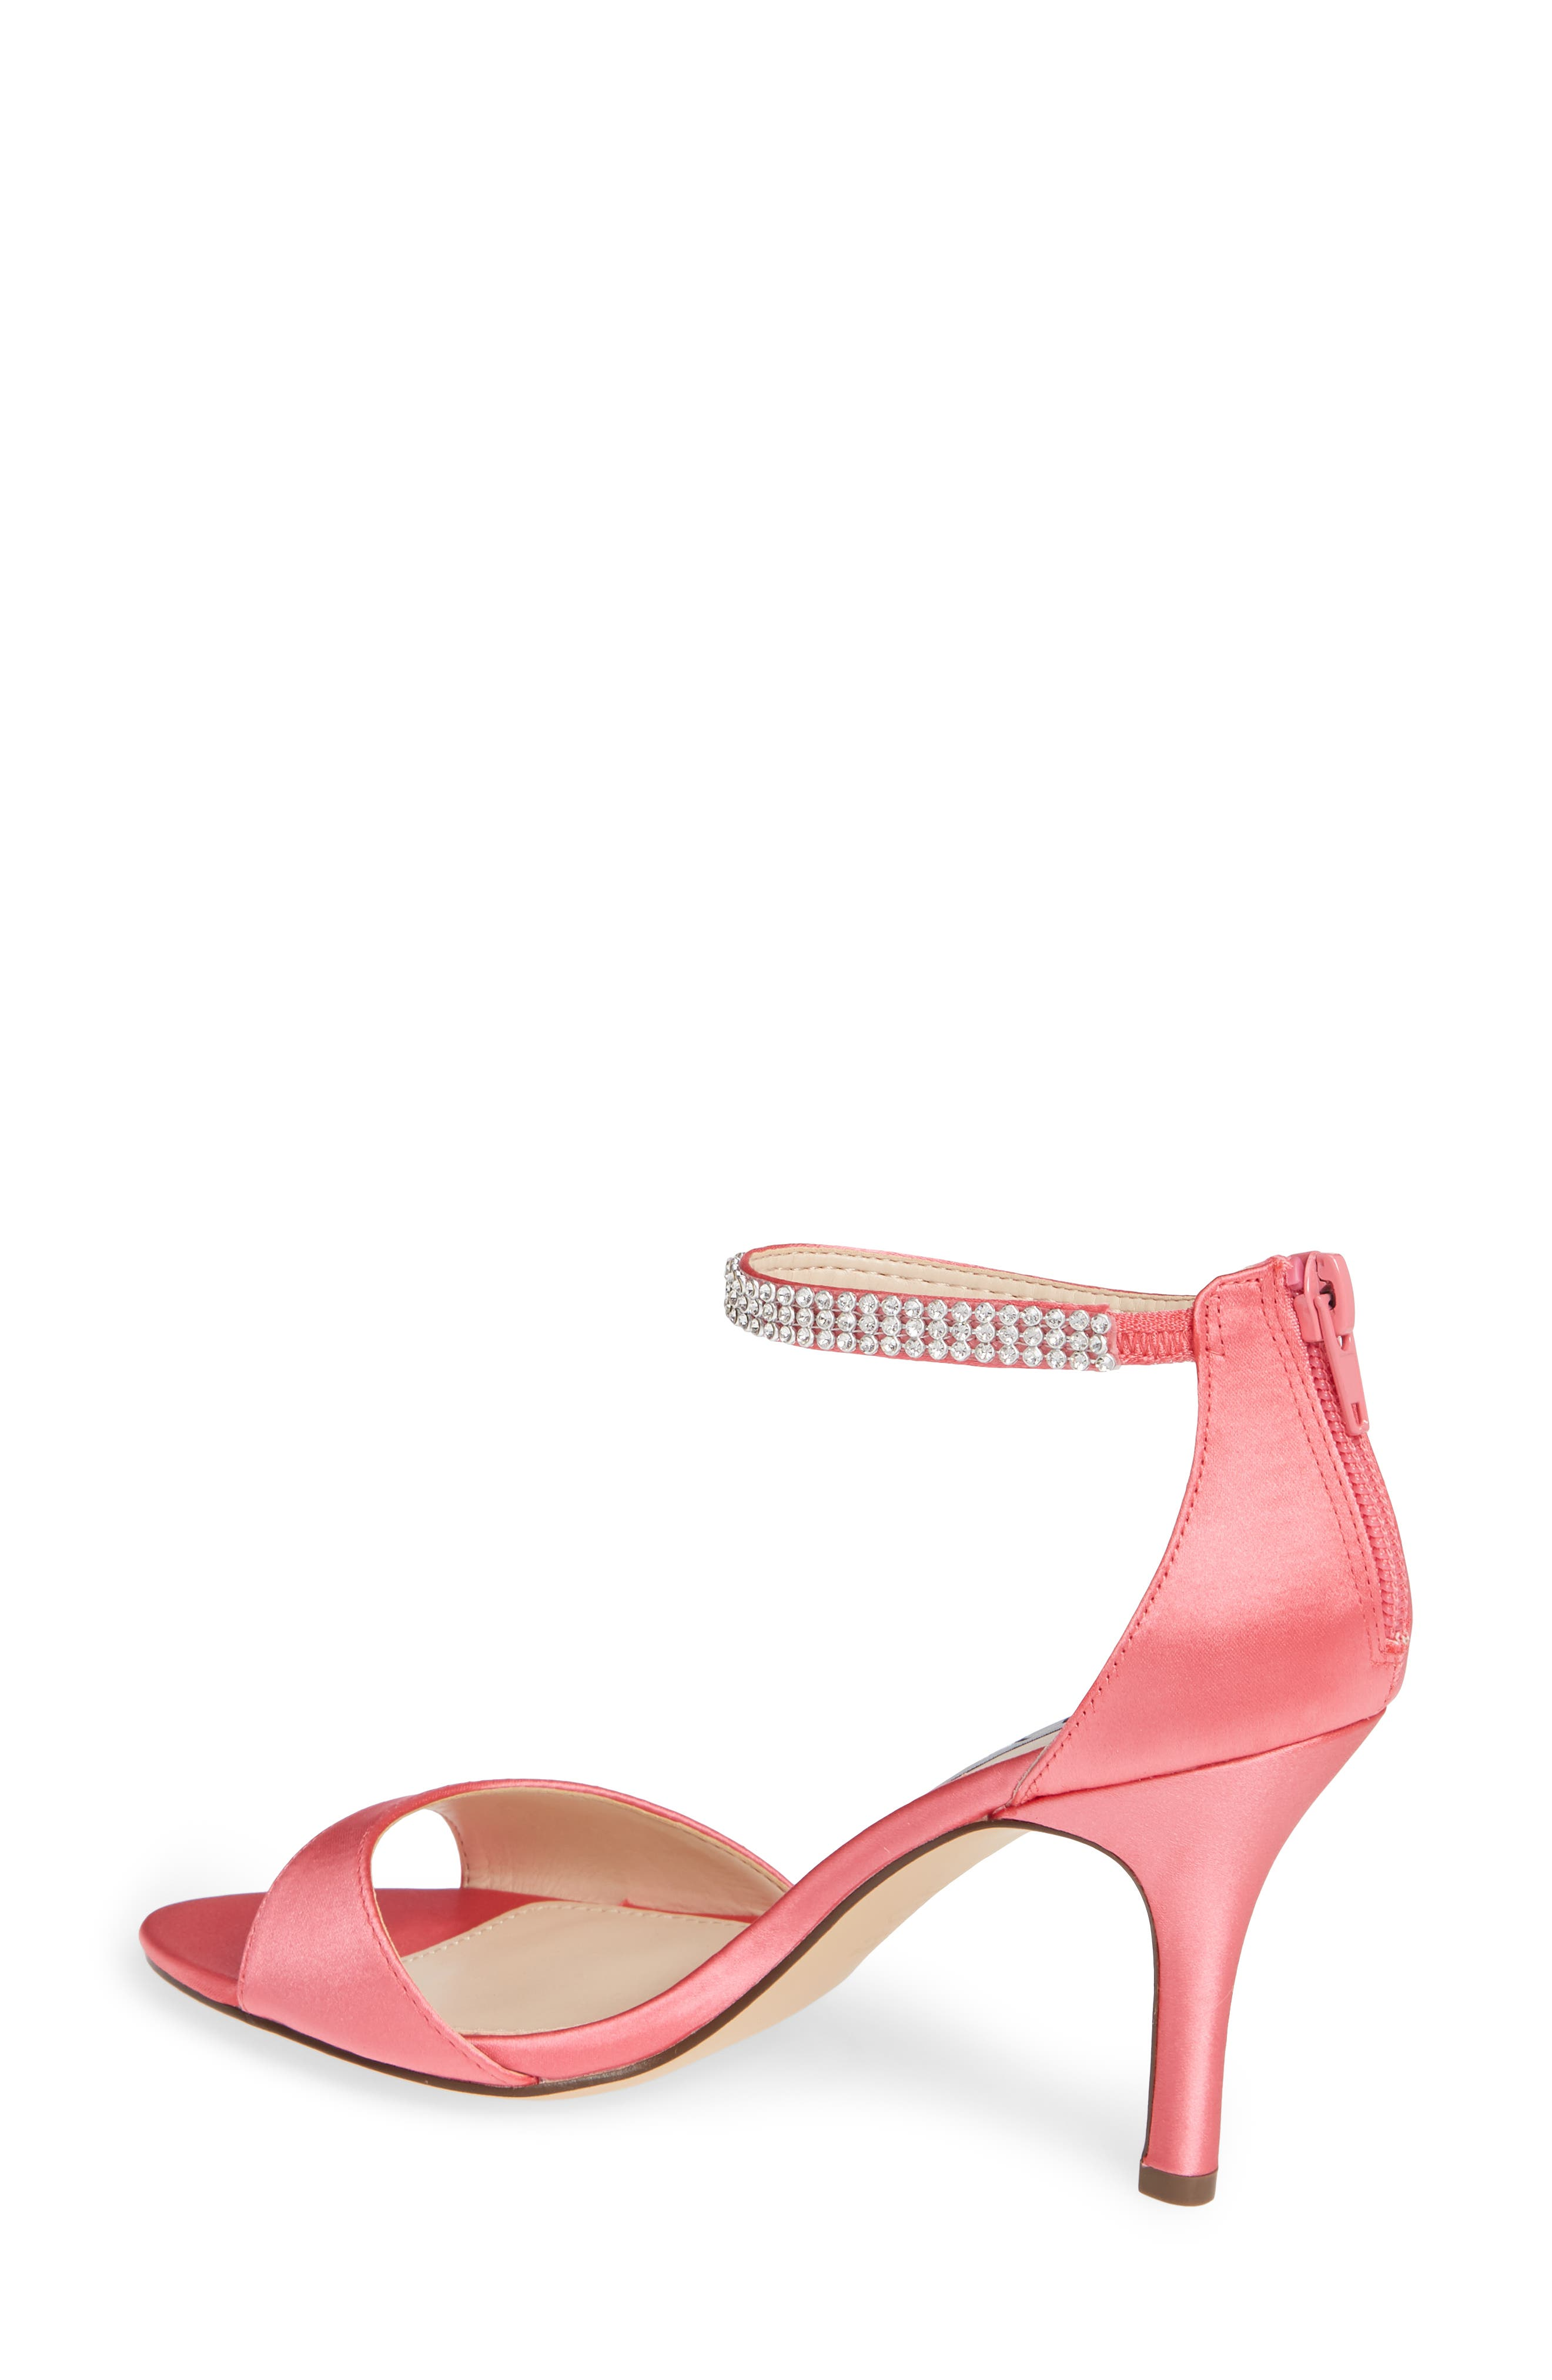 NINA, Volanda Ankle Strap Sandal, Alternate thumbnail 2, color, STRAWBERRY PUNCH SATIN